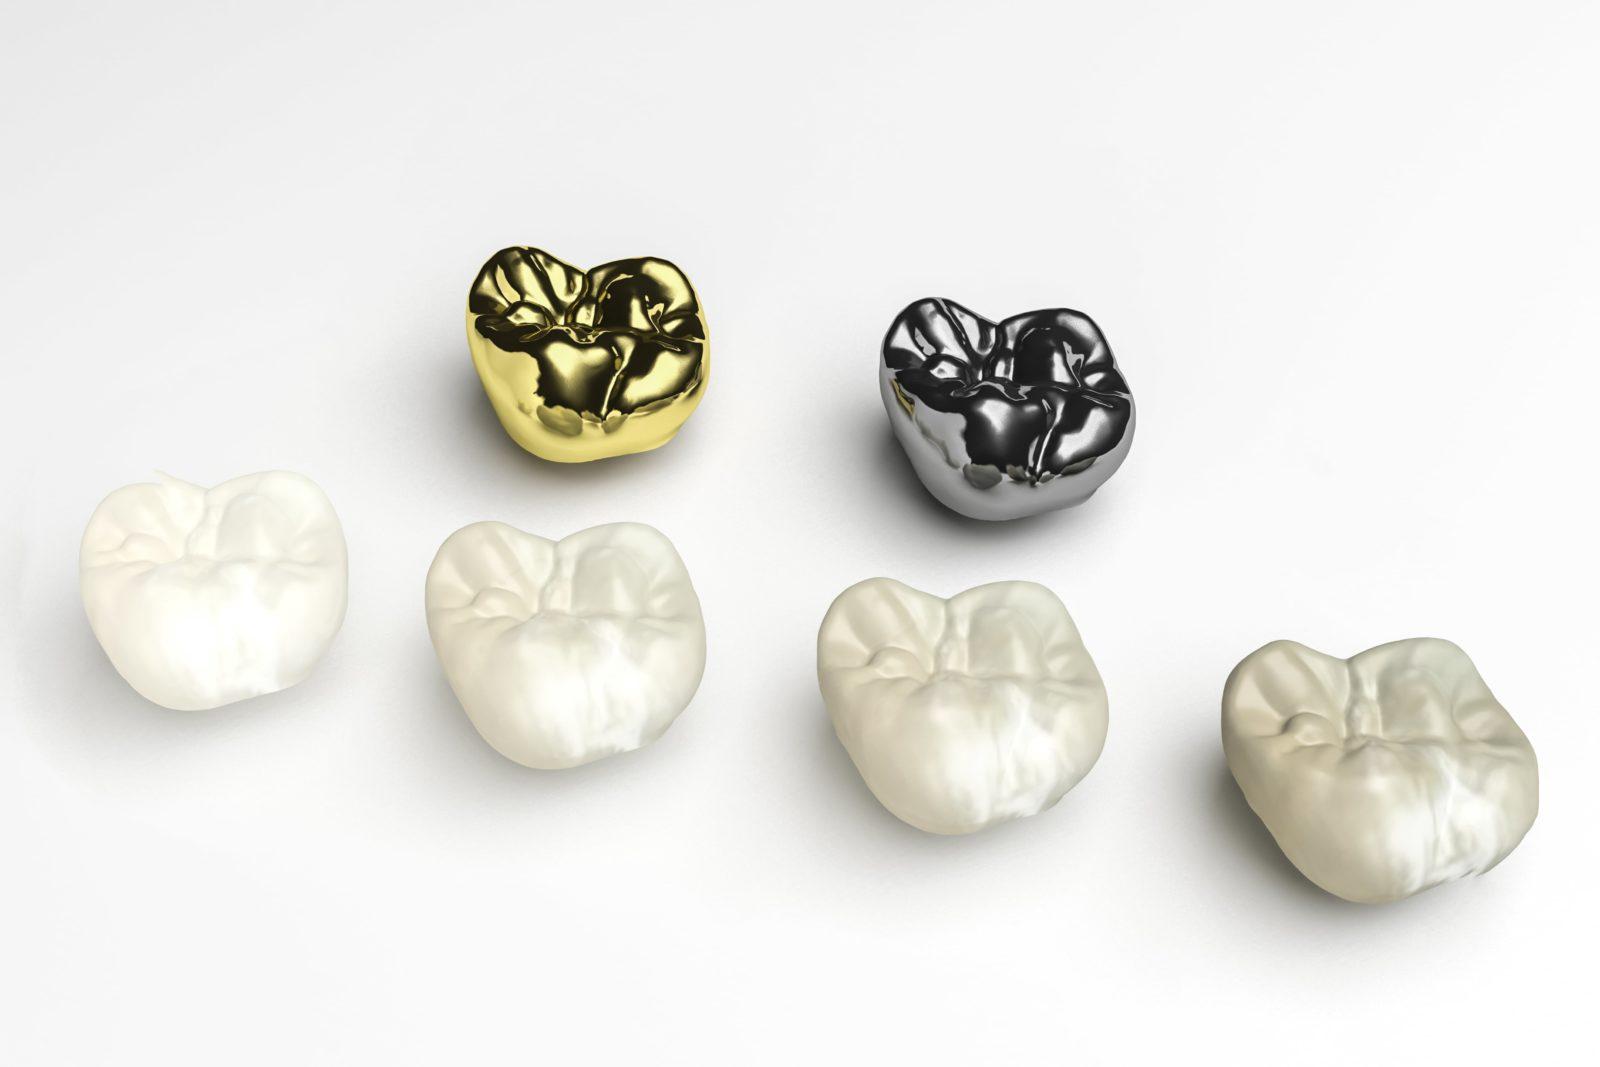 various types of dental crowns